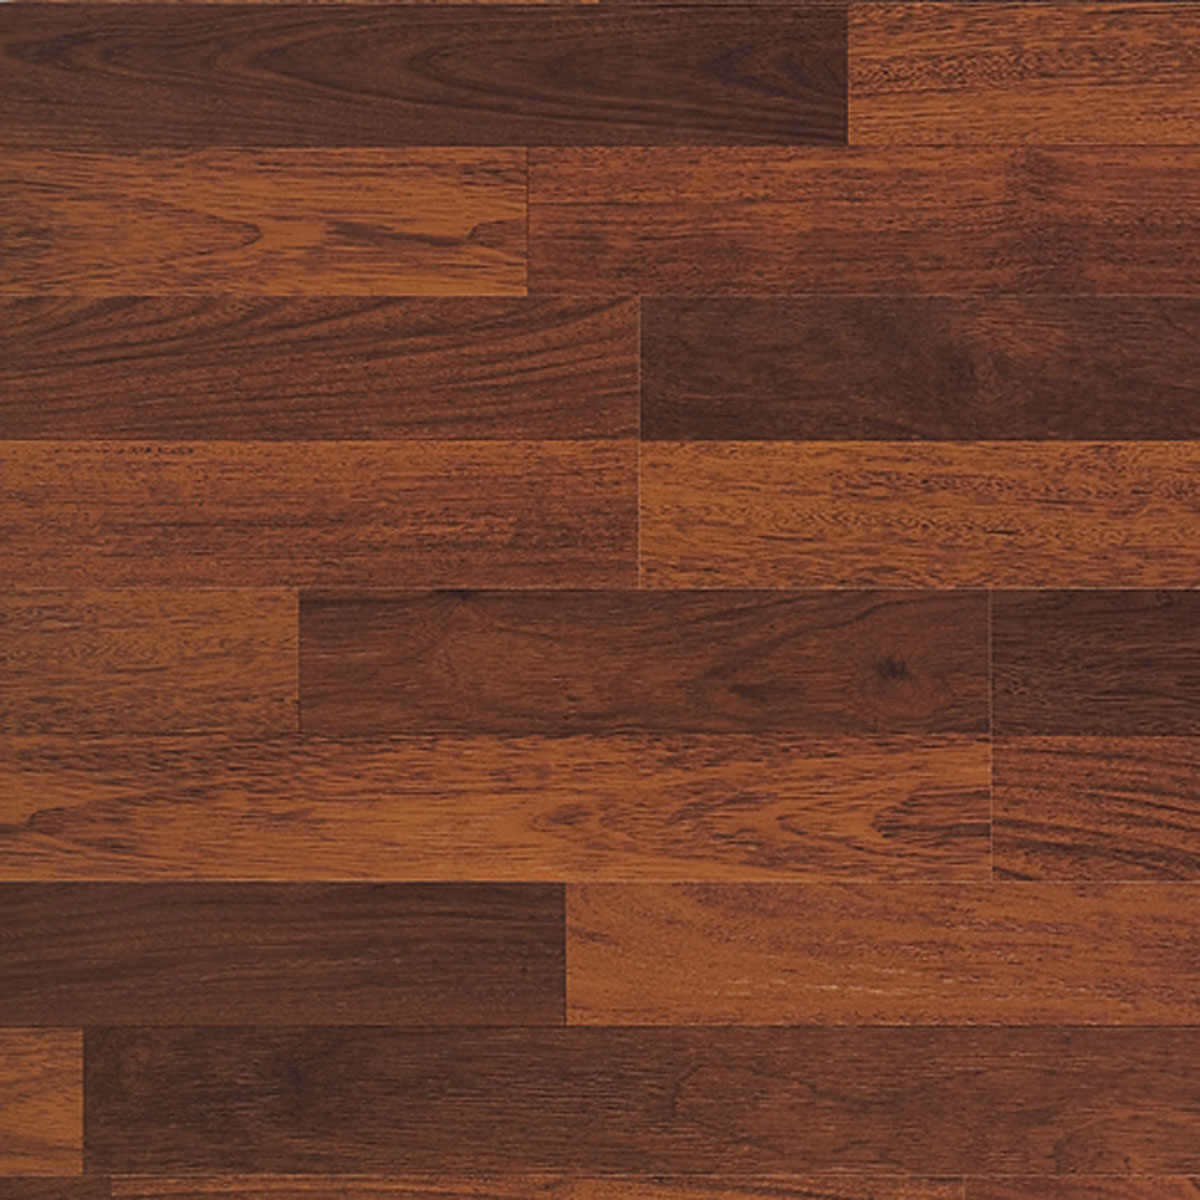 flooring wood wood floor patterns picture OUHNIUZ